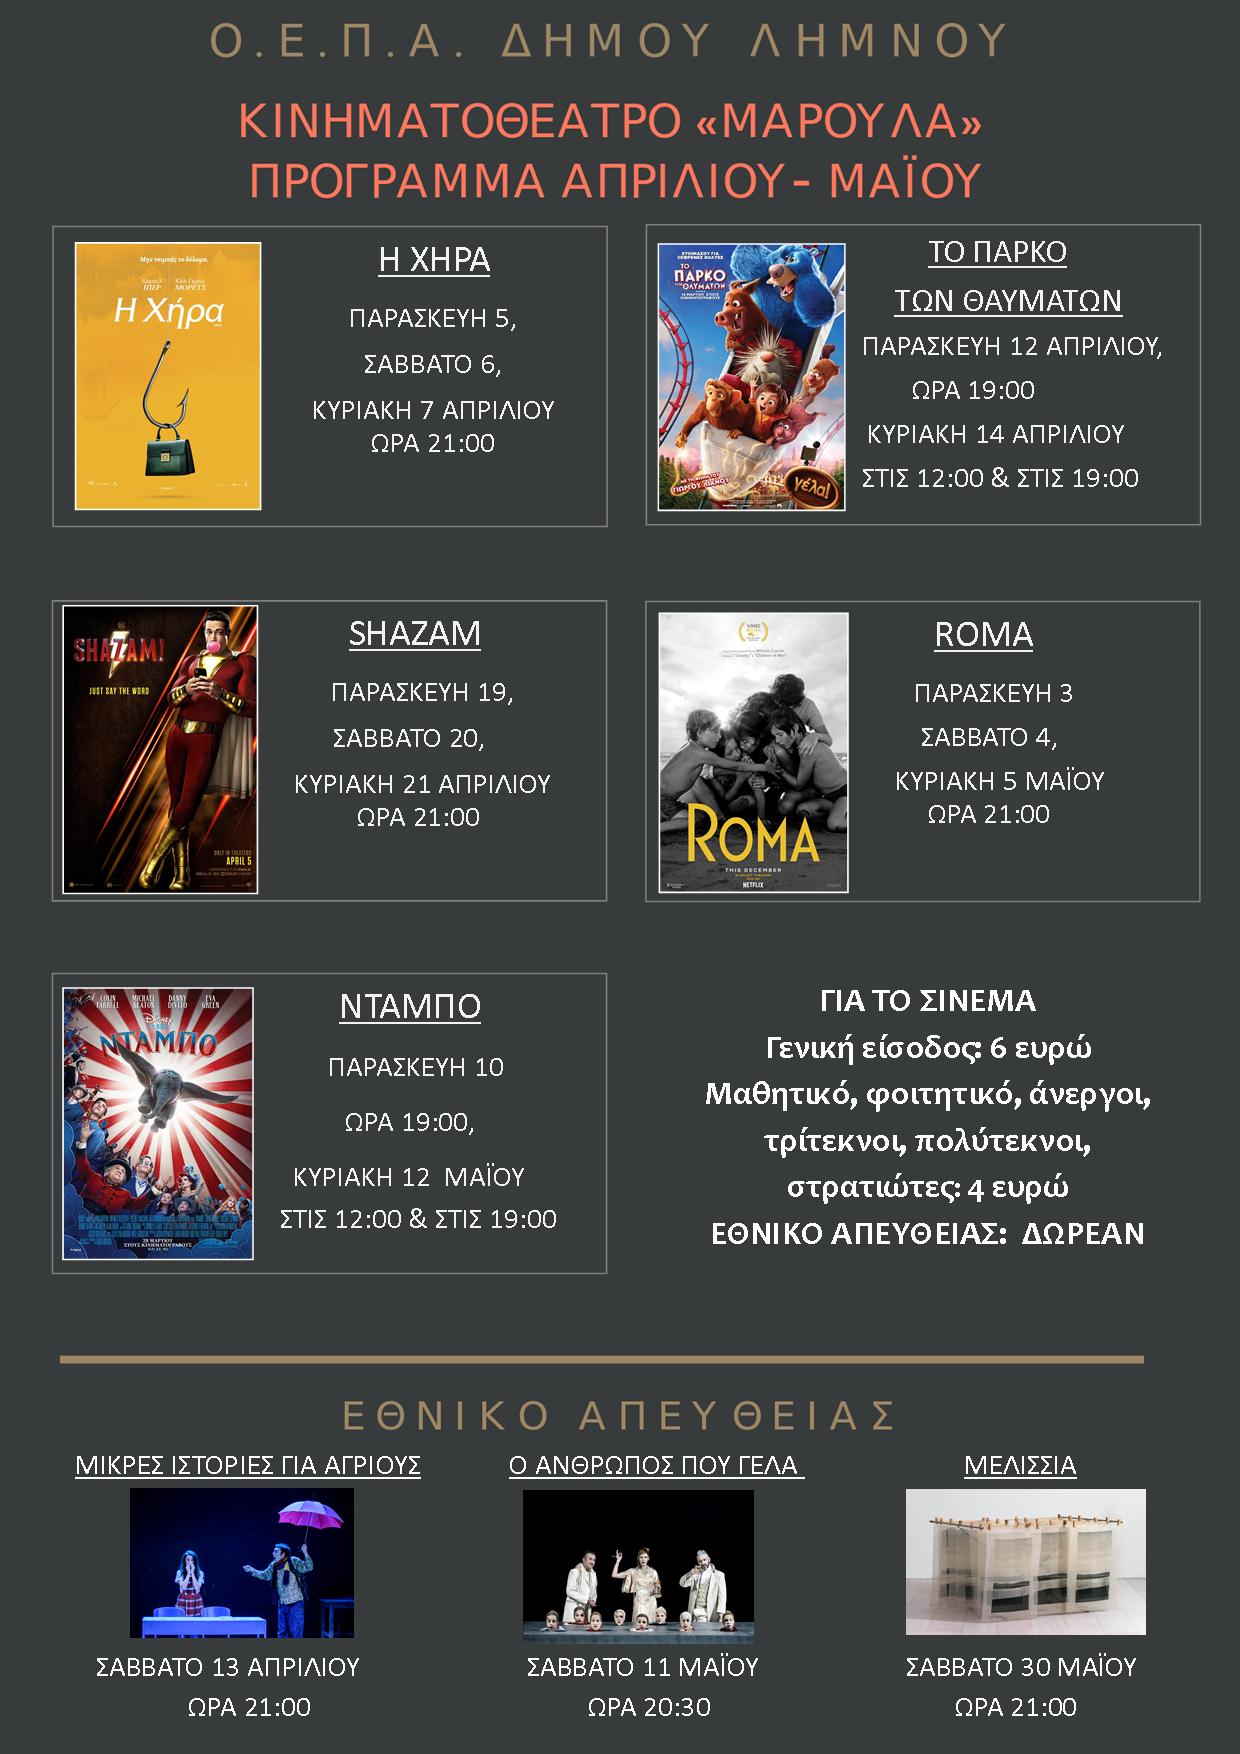 5bf036d6703 marprogaprma19.png. Πέντε απίθανες κινηματογραφικές ταινίες